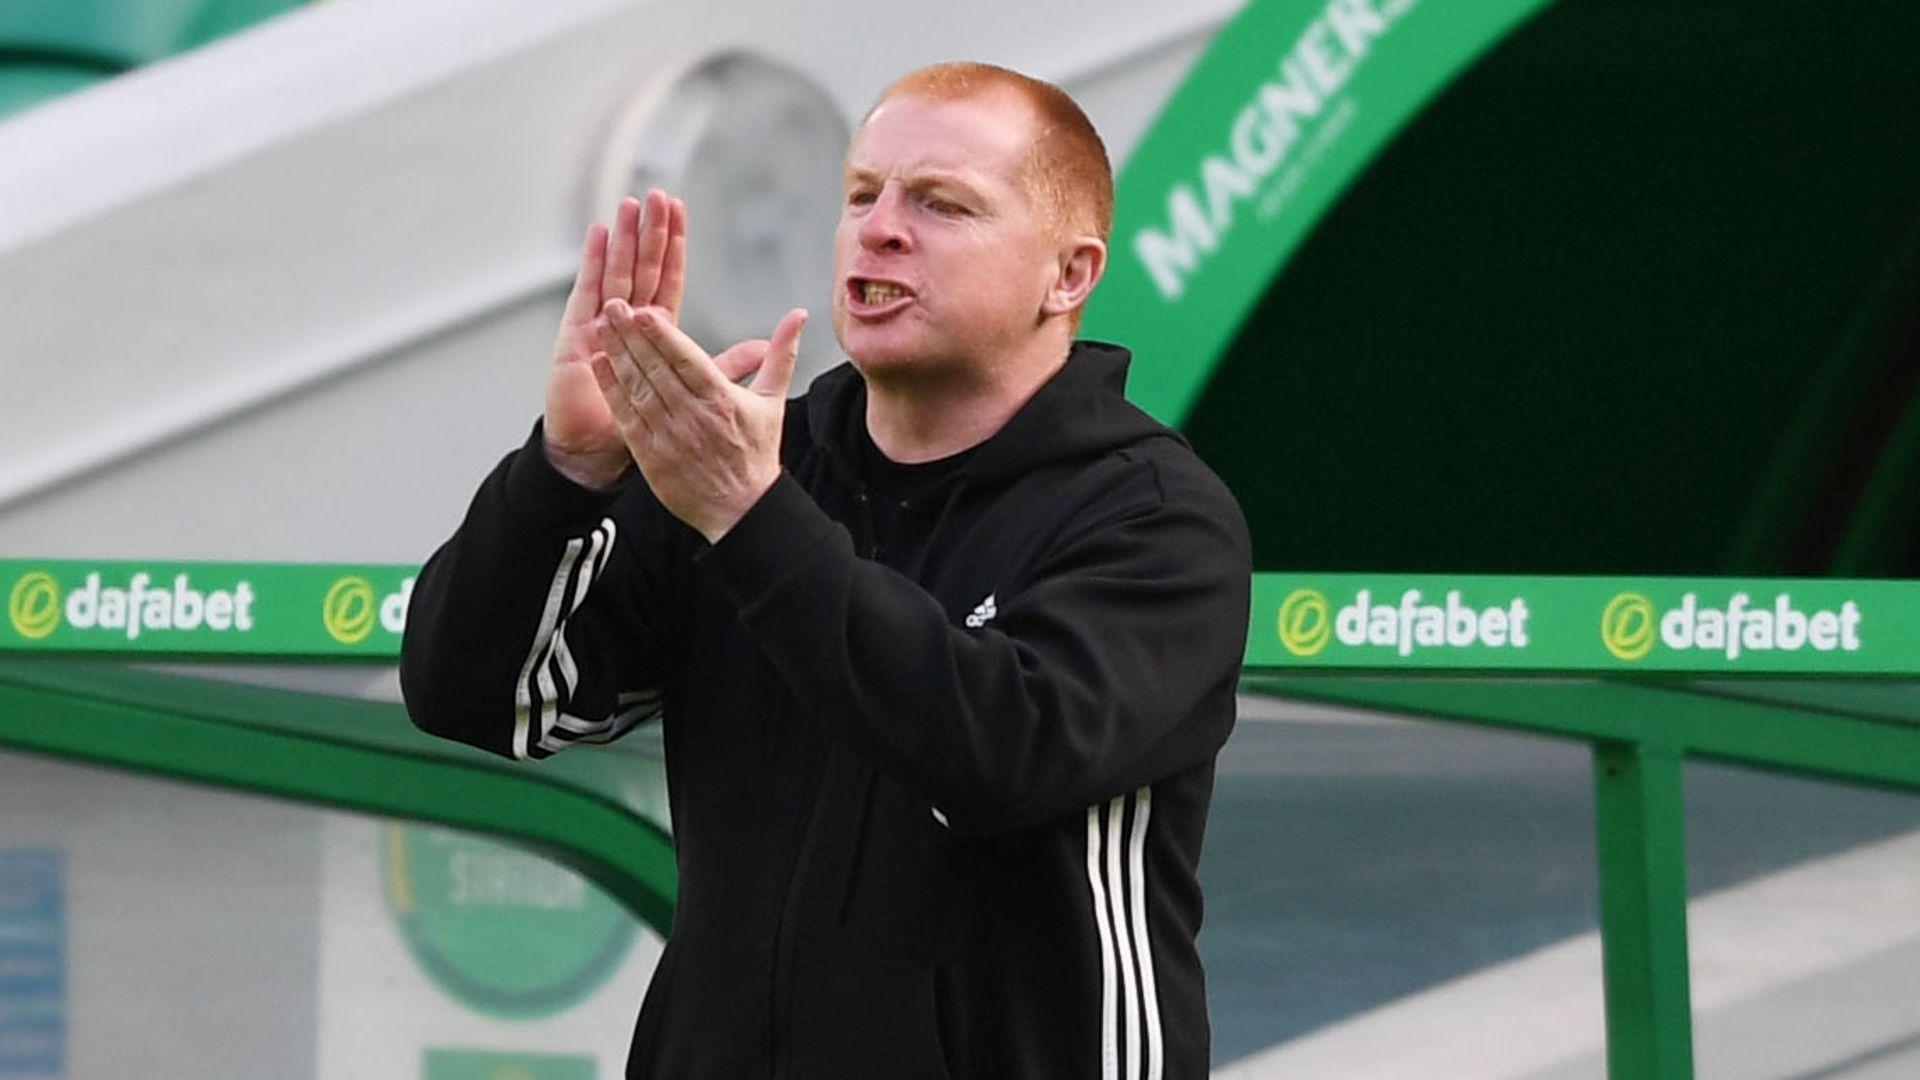 Celtic to play KR Reykjavik in CL qualifying